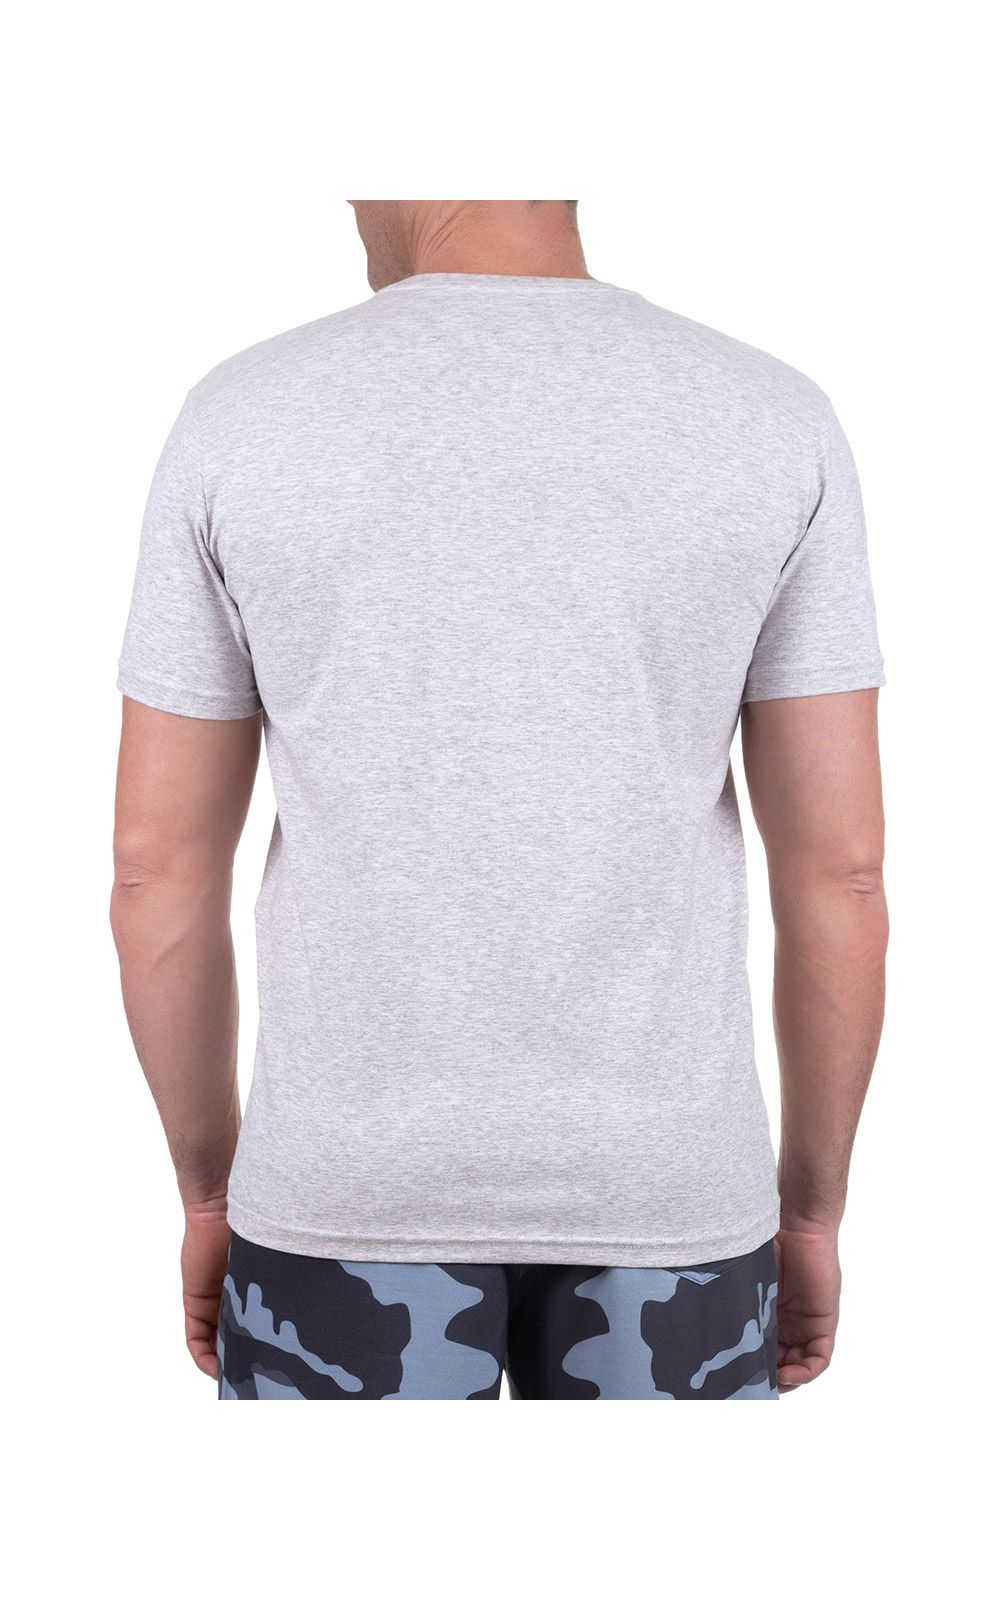 Foto 2 - Camiseta Masculina Cinza Claro Lisa